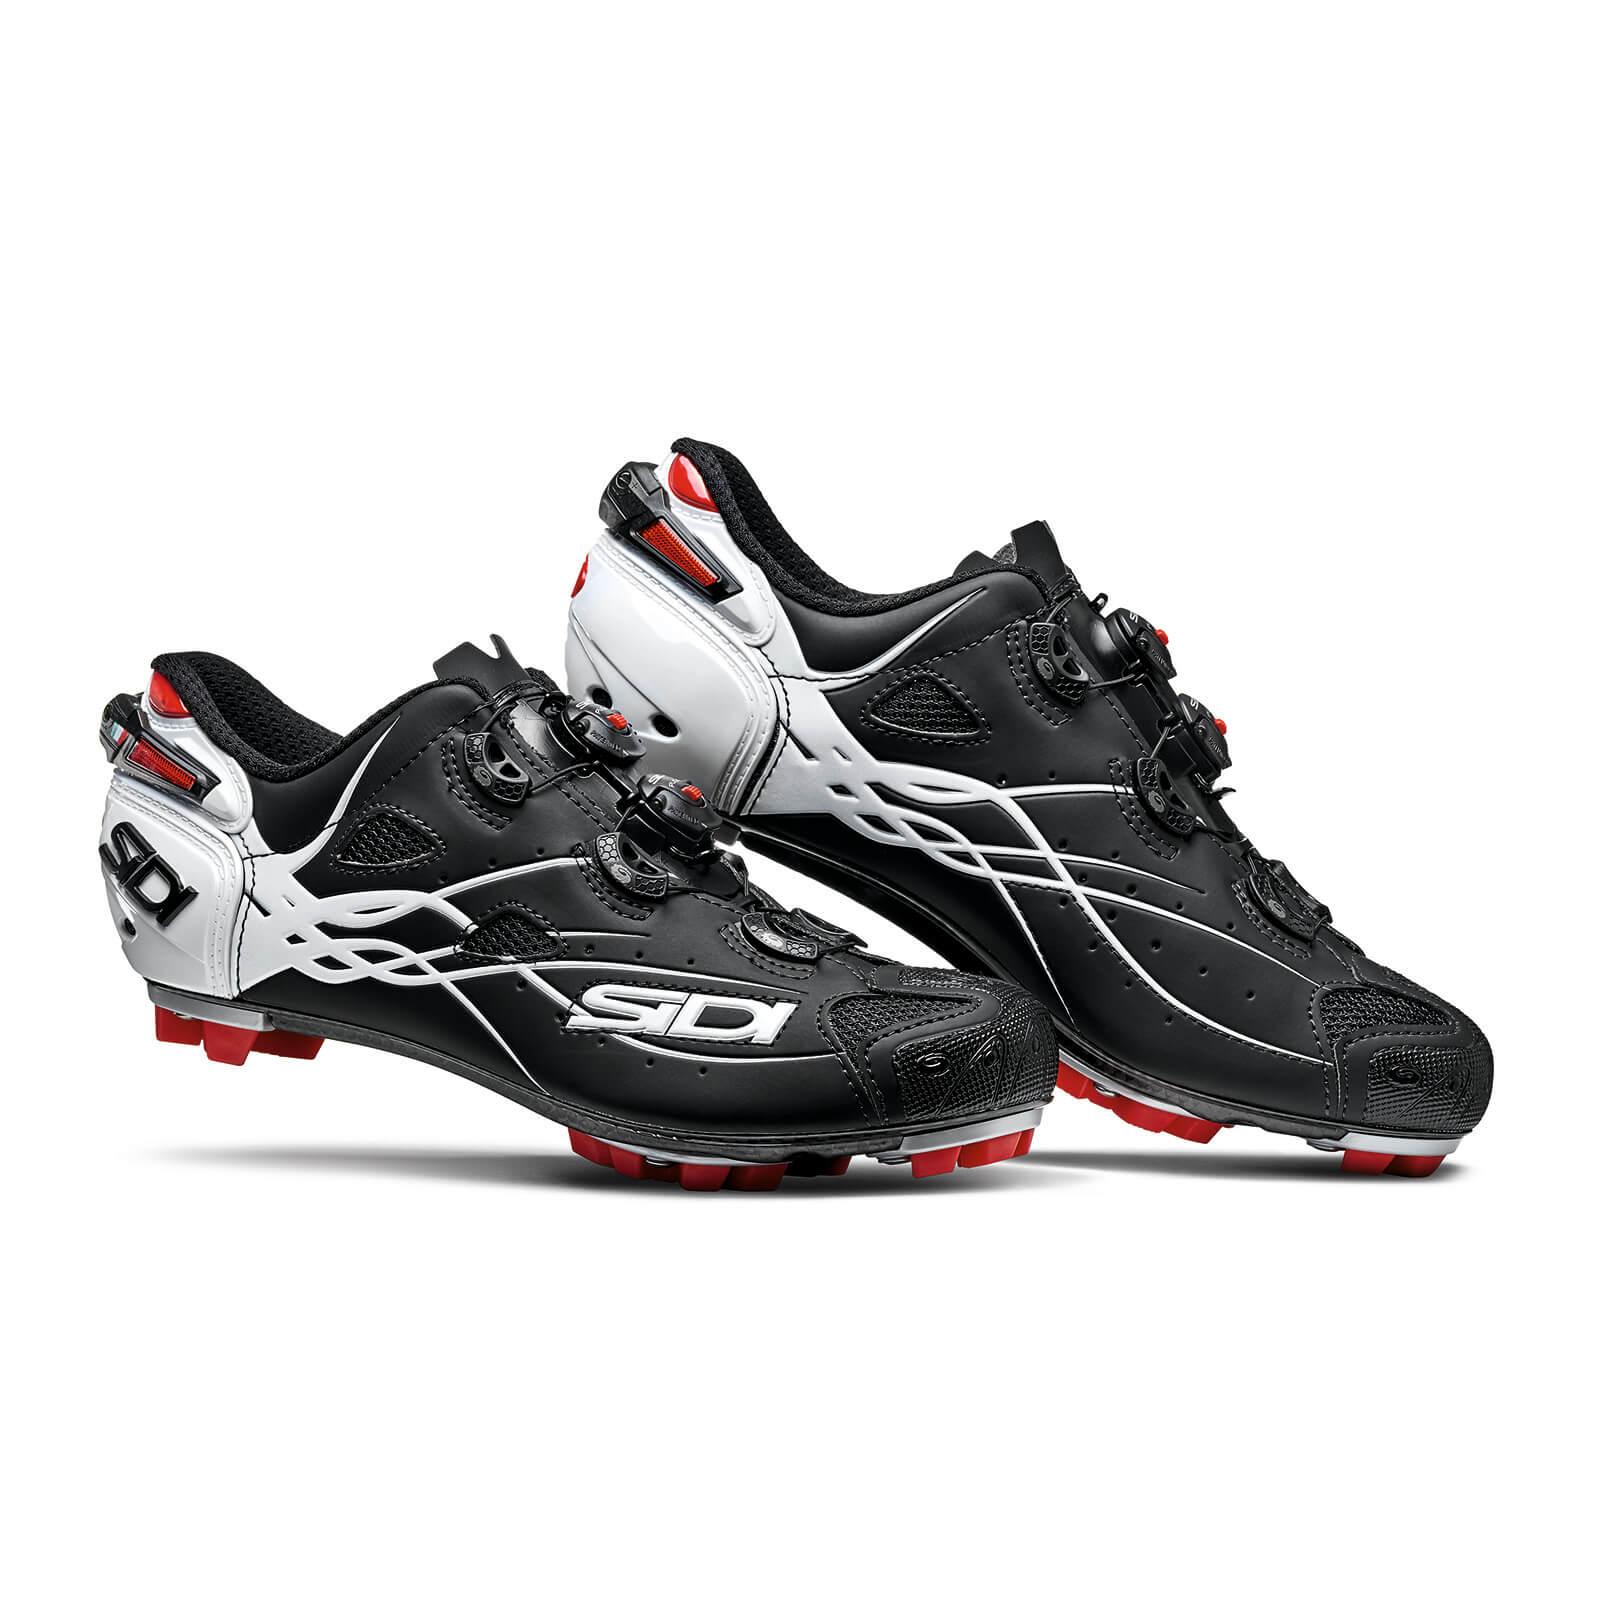 Sidi Tiger Carbon MTB Shoes - Matt Black/Gloss White - EU 44 - Matt Black/Gloss White